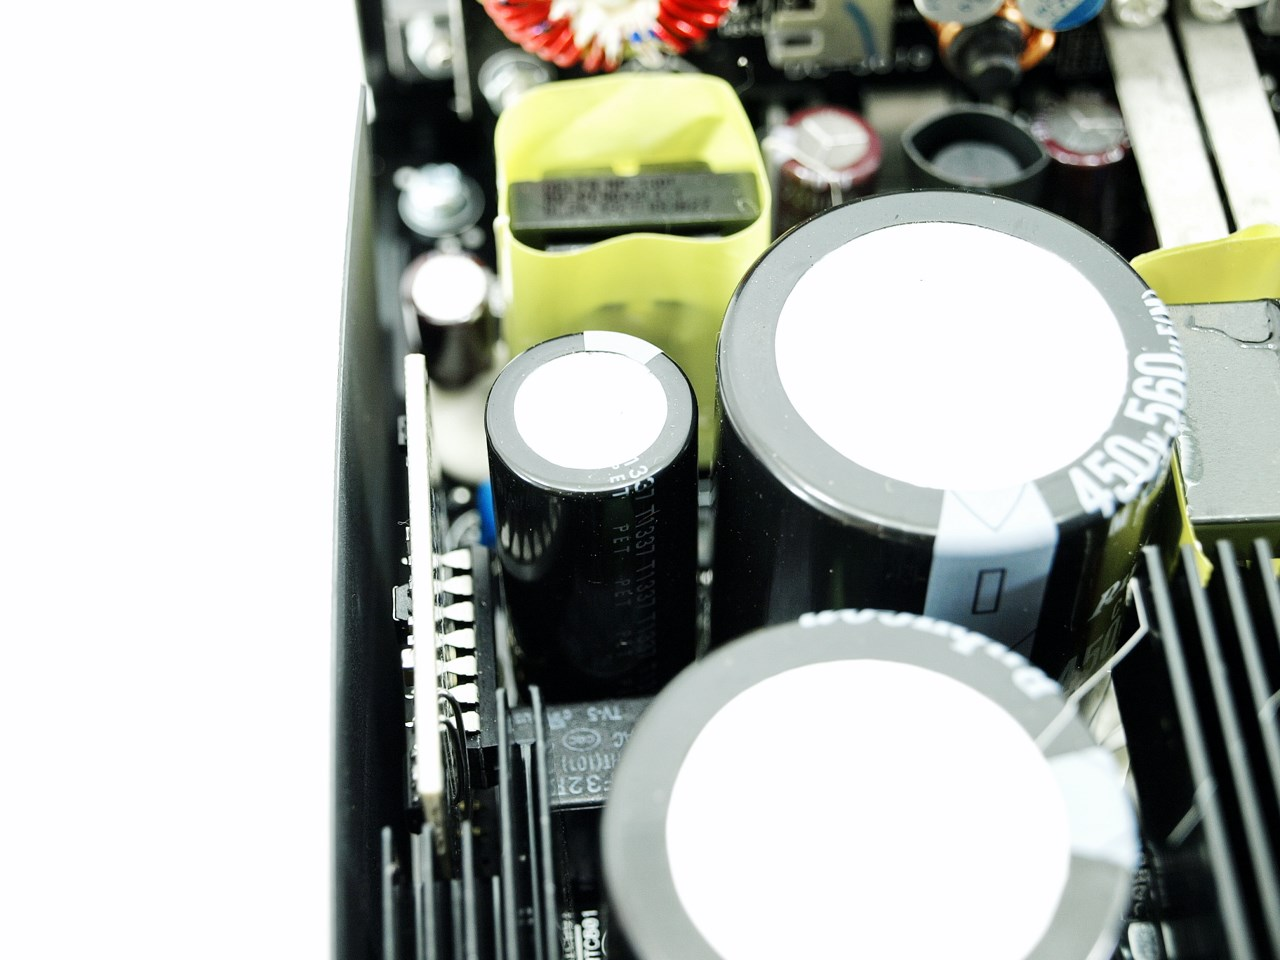 Nikktech Antec Hcp 1300 1300w Power Supply Unit 1 1